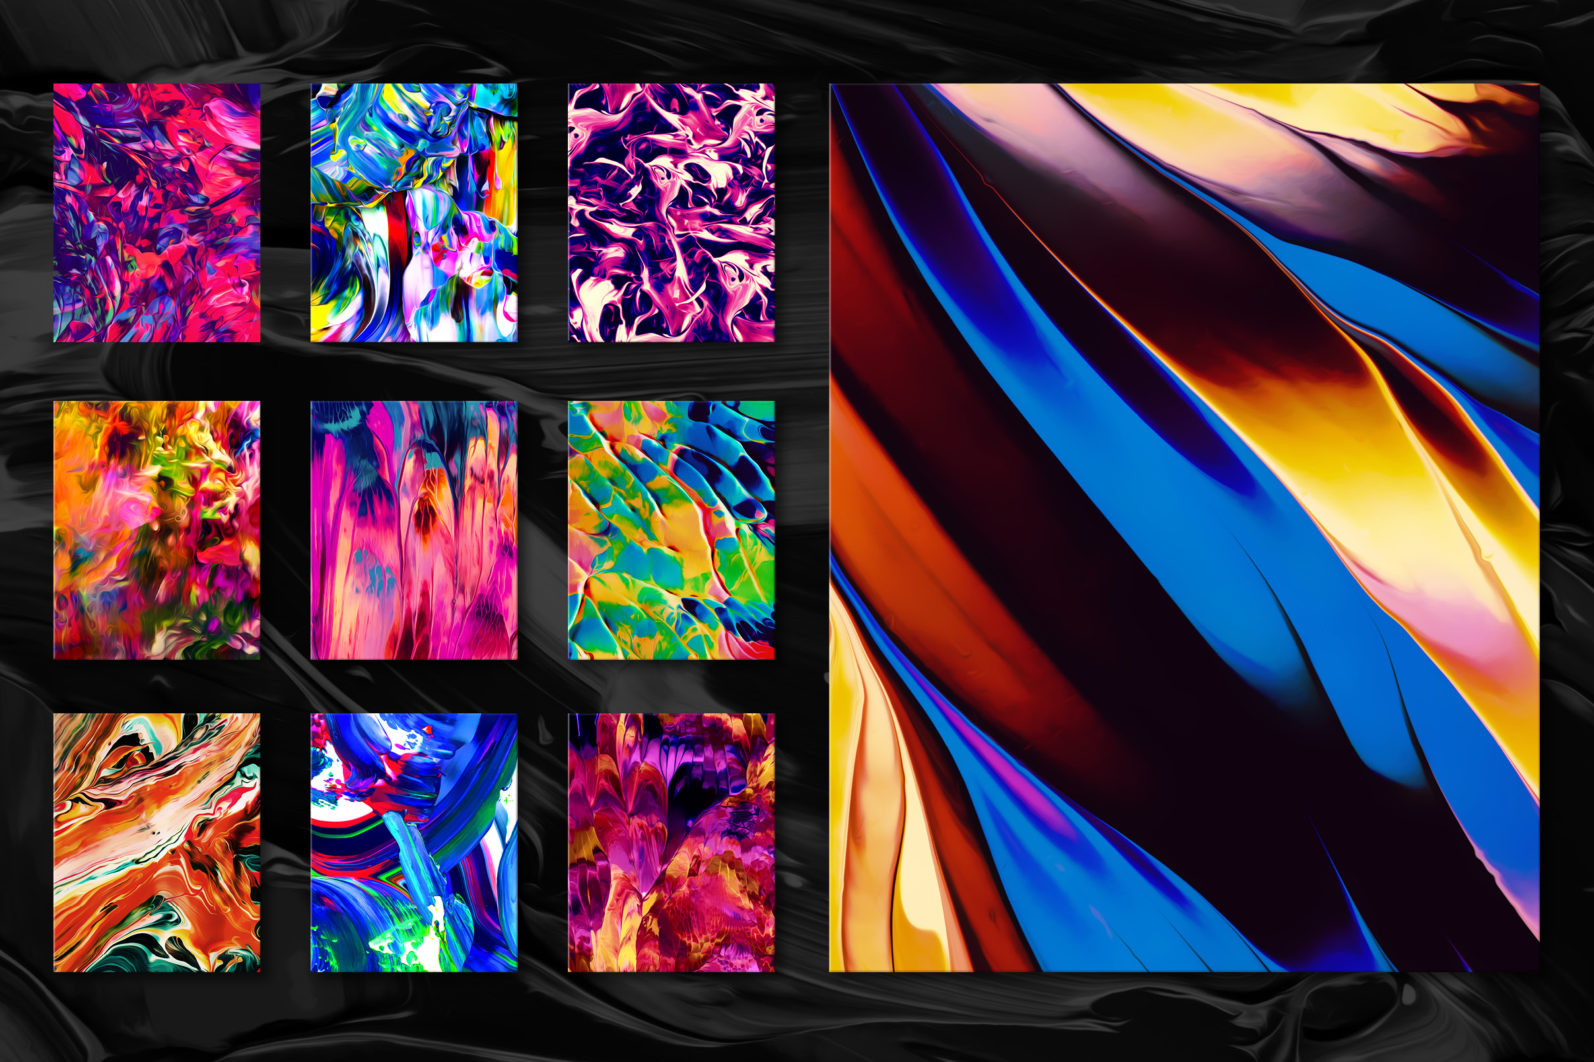 Flow, Vol. 2: 100 Smooth Paint Textures - Flow Vol 2 Preview 05 -